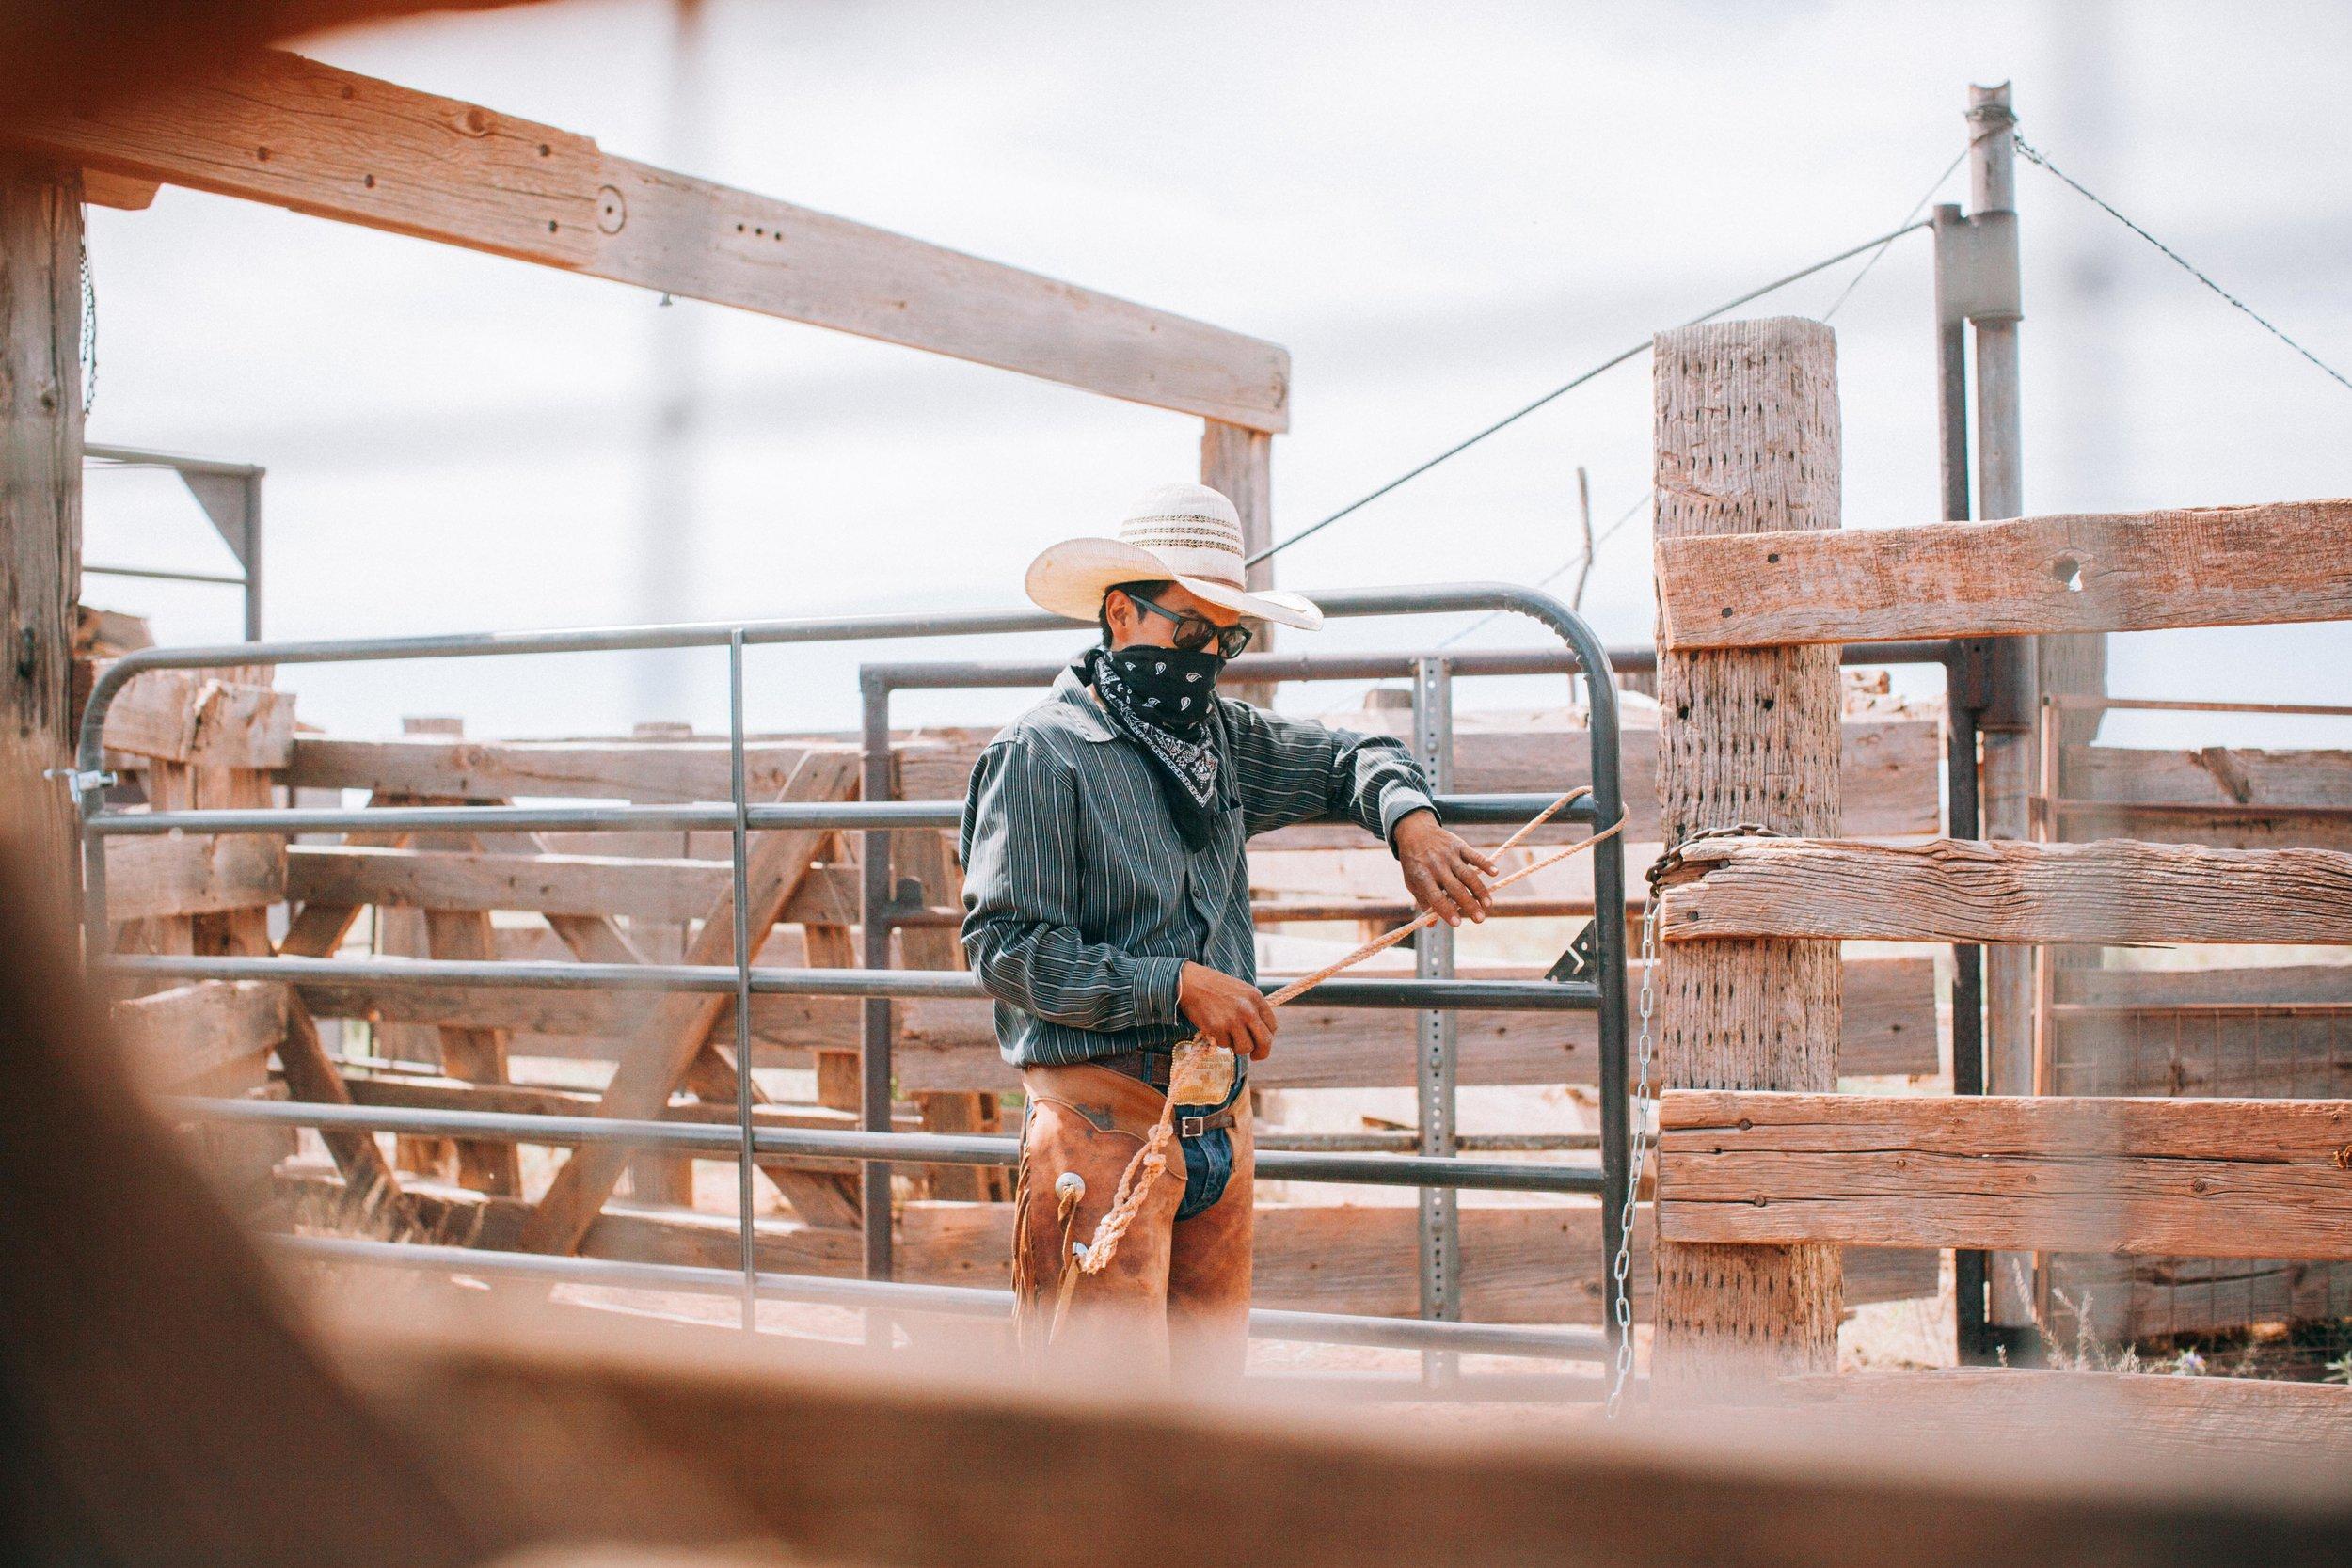 cattle-drive-8498.jpg